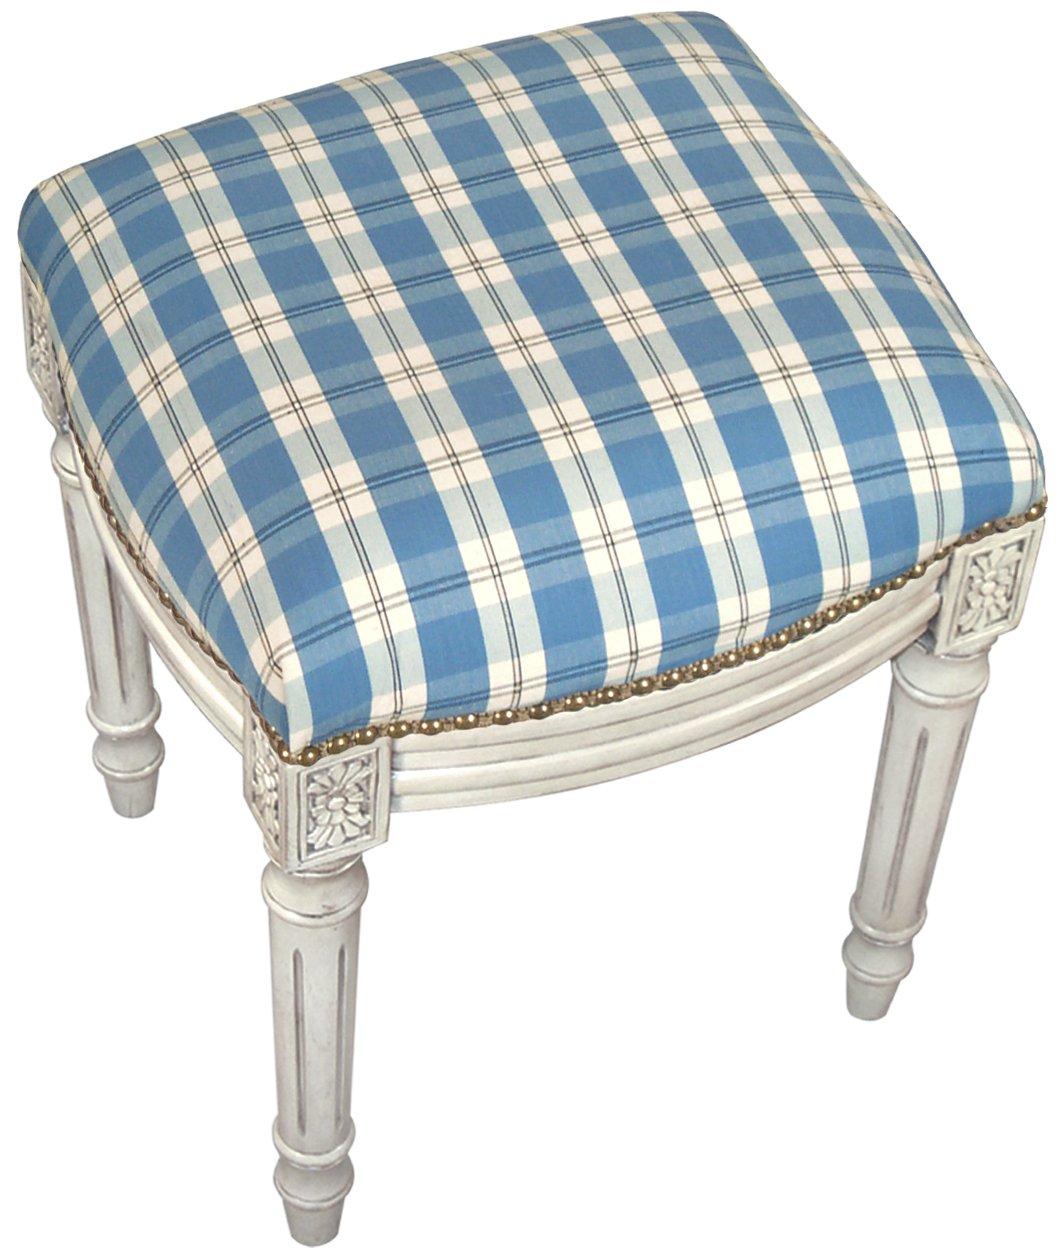 SketchONE Upholstered Vanity Stool, Plaid, Blue